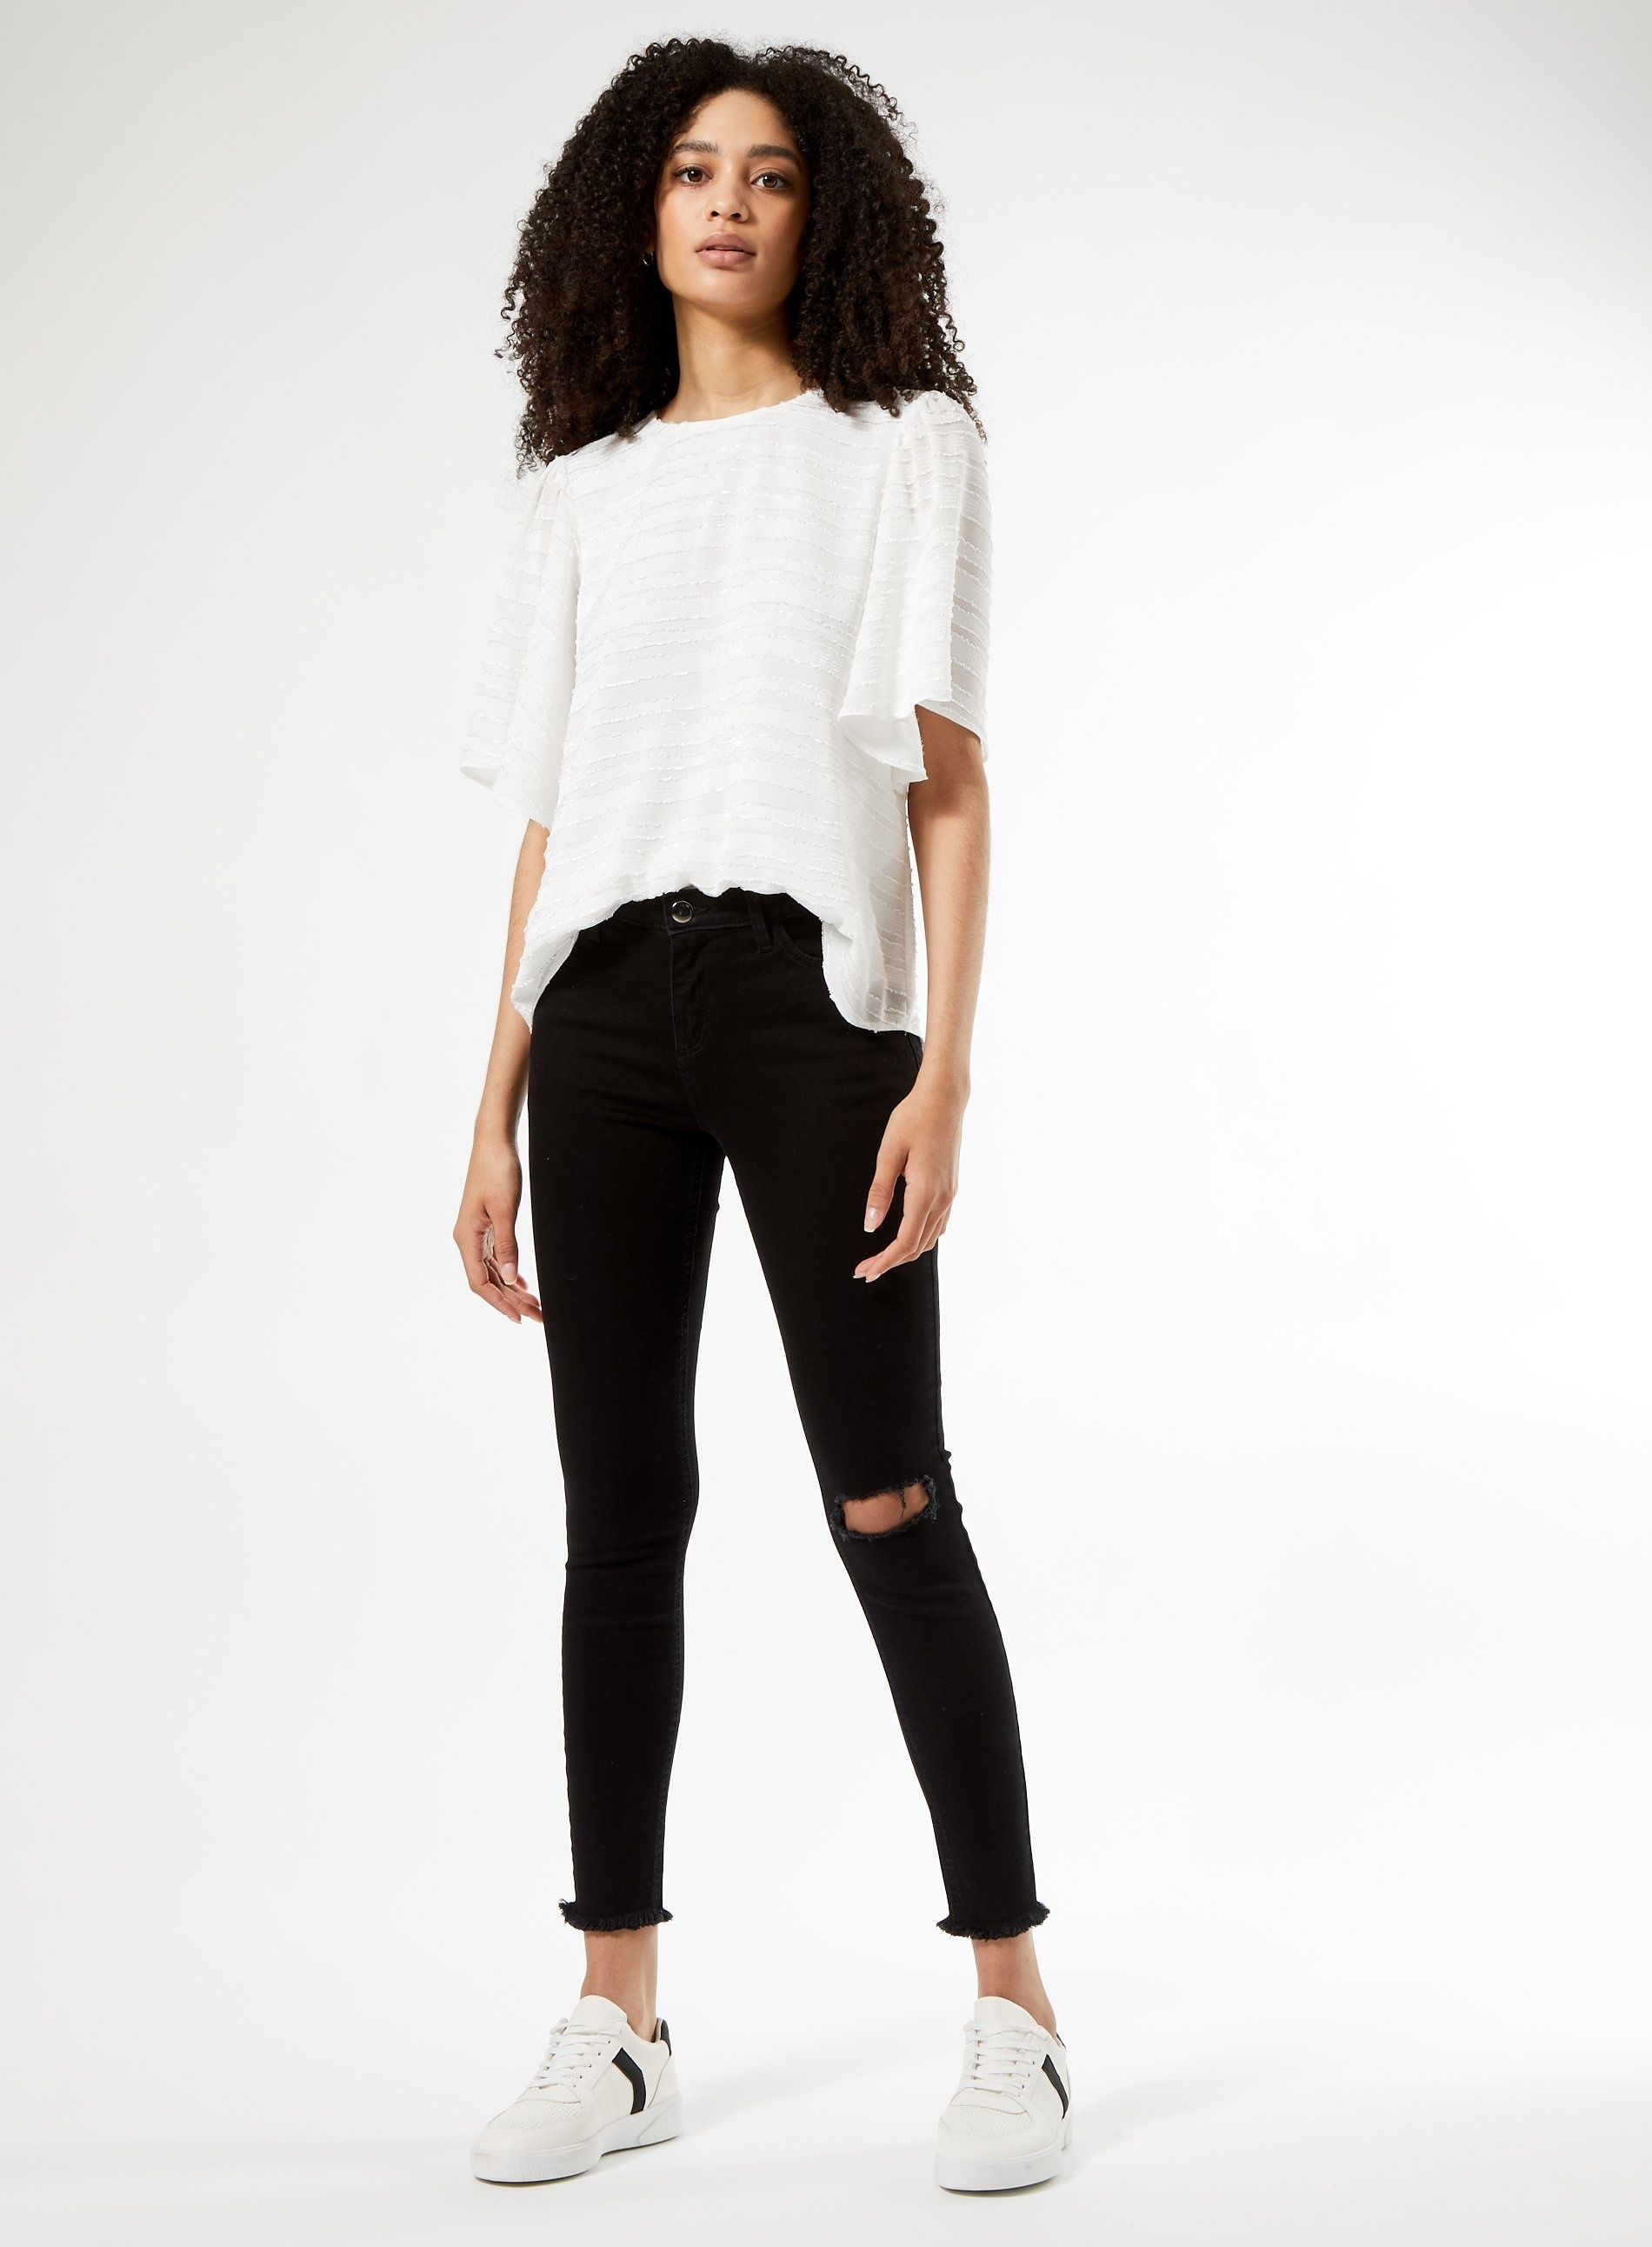 Dorothy Perkins Womens Black Rip Raw Hem Denim Darcy Skinny Jeans Pants Trousers